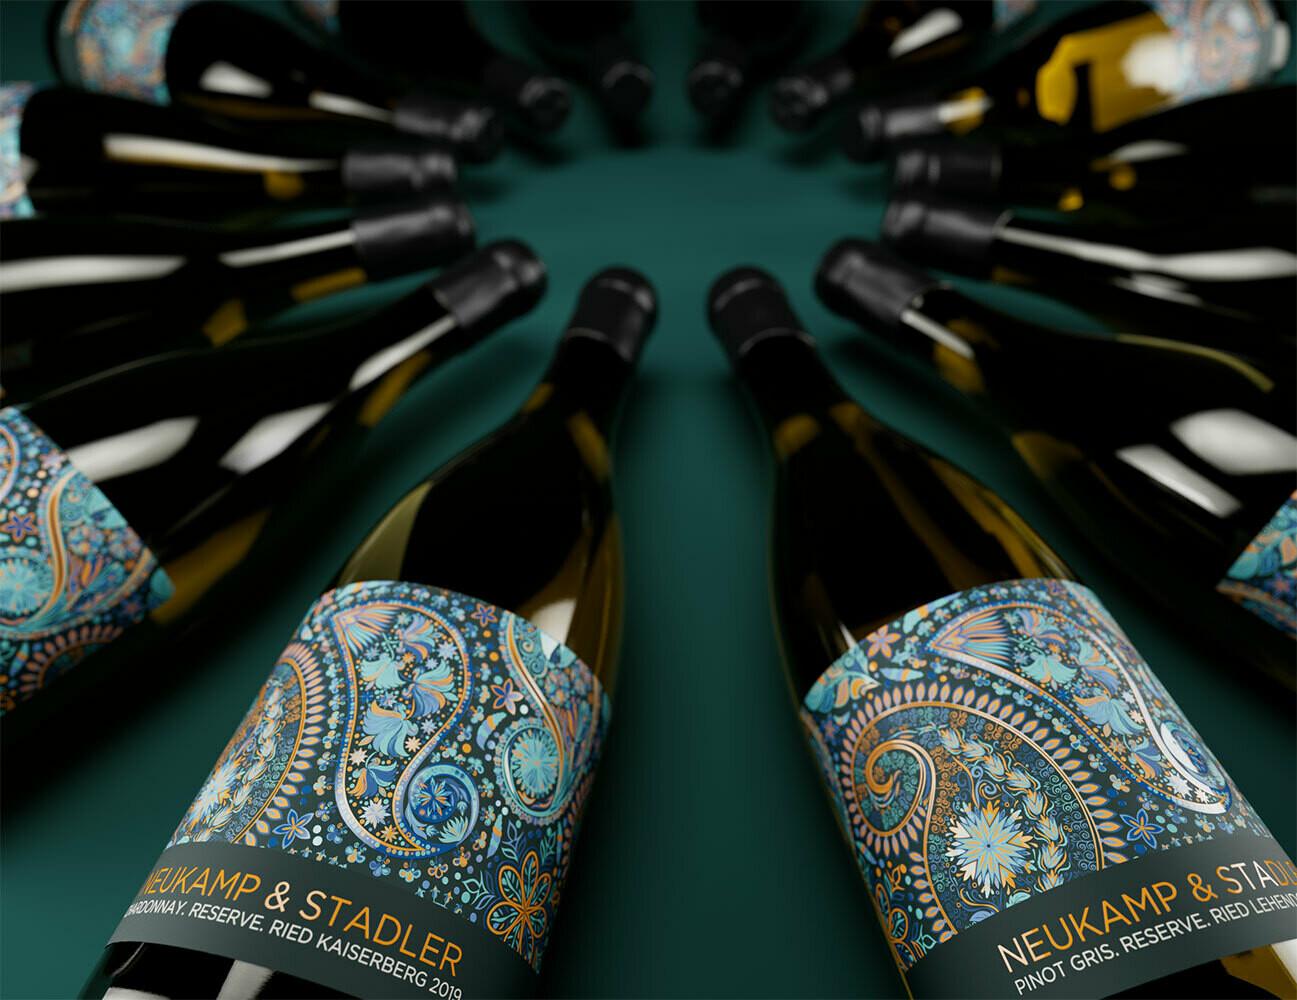 """2 x Pinot Gris Reserve und 1 x Chardonnay Reserve 2019"" - trocken - 3 Flaschen à 0,75l (AT)"